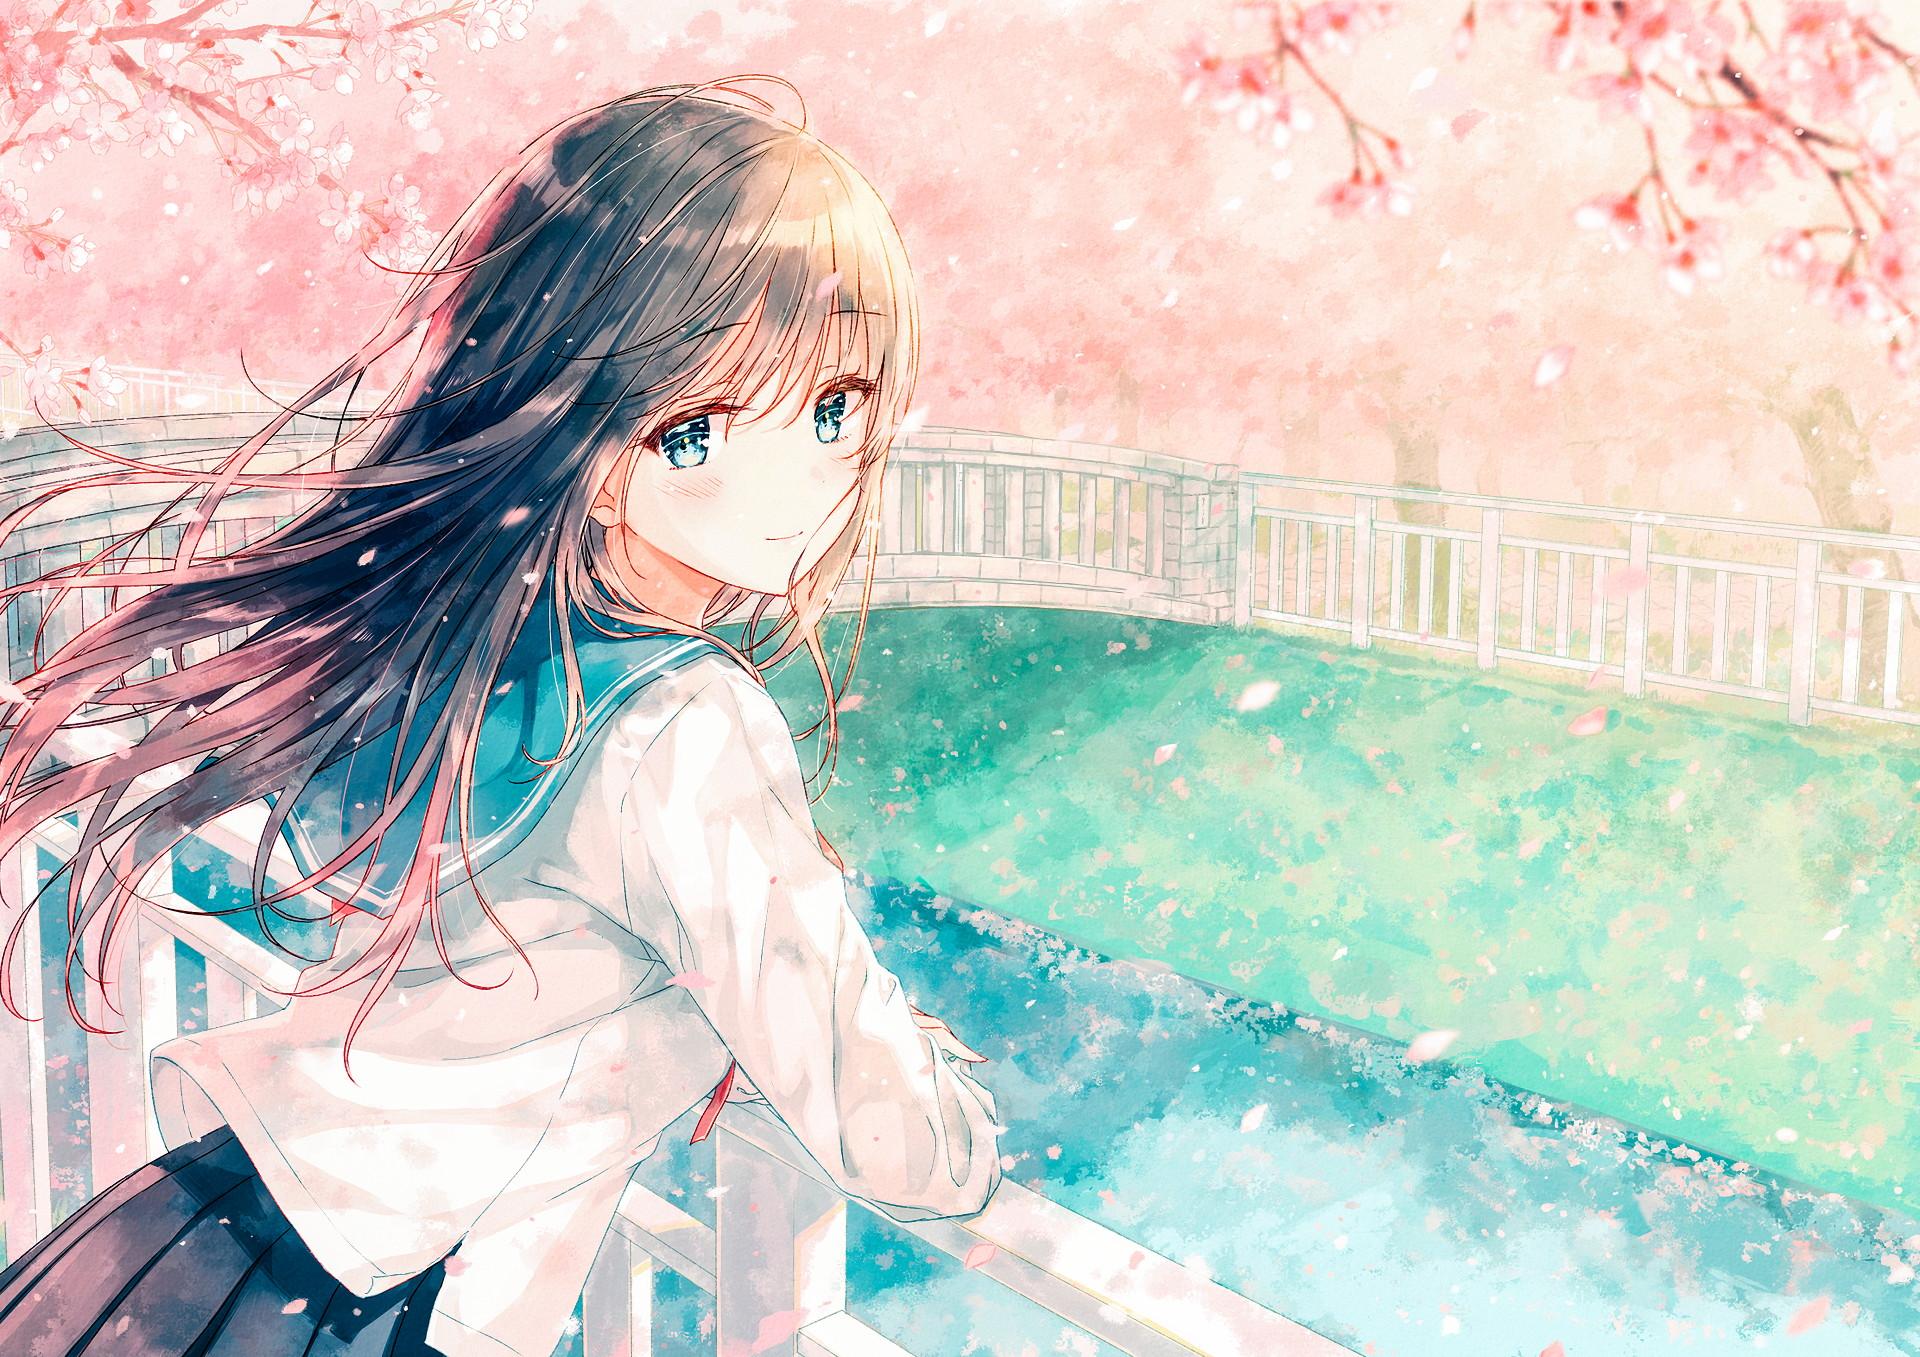 hinh nen anime girl dang yeu 40